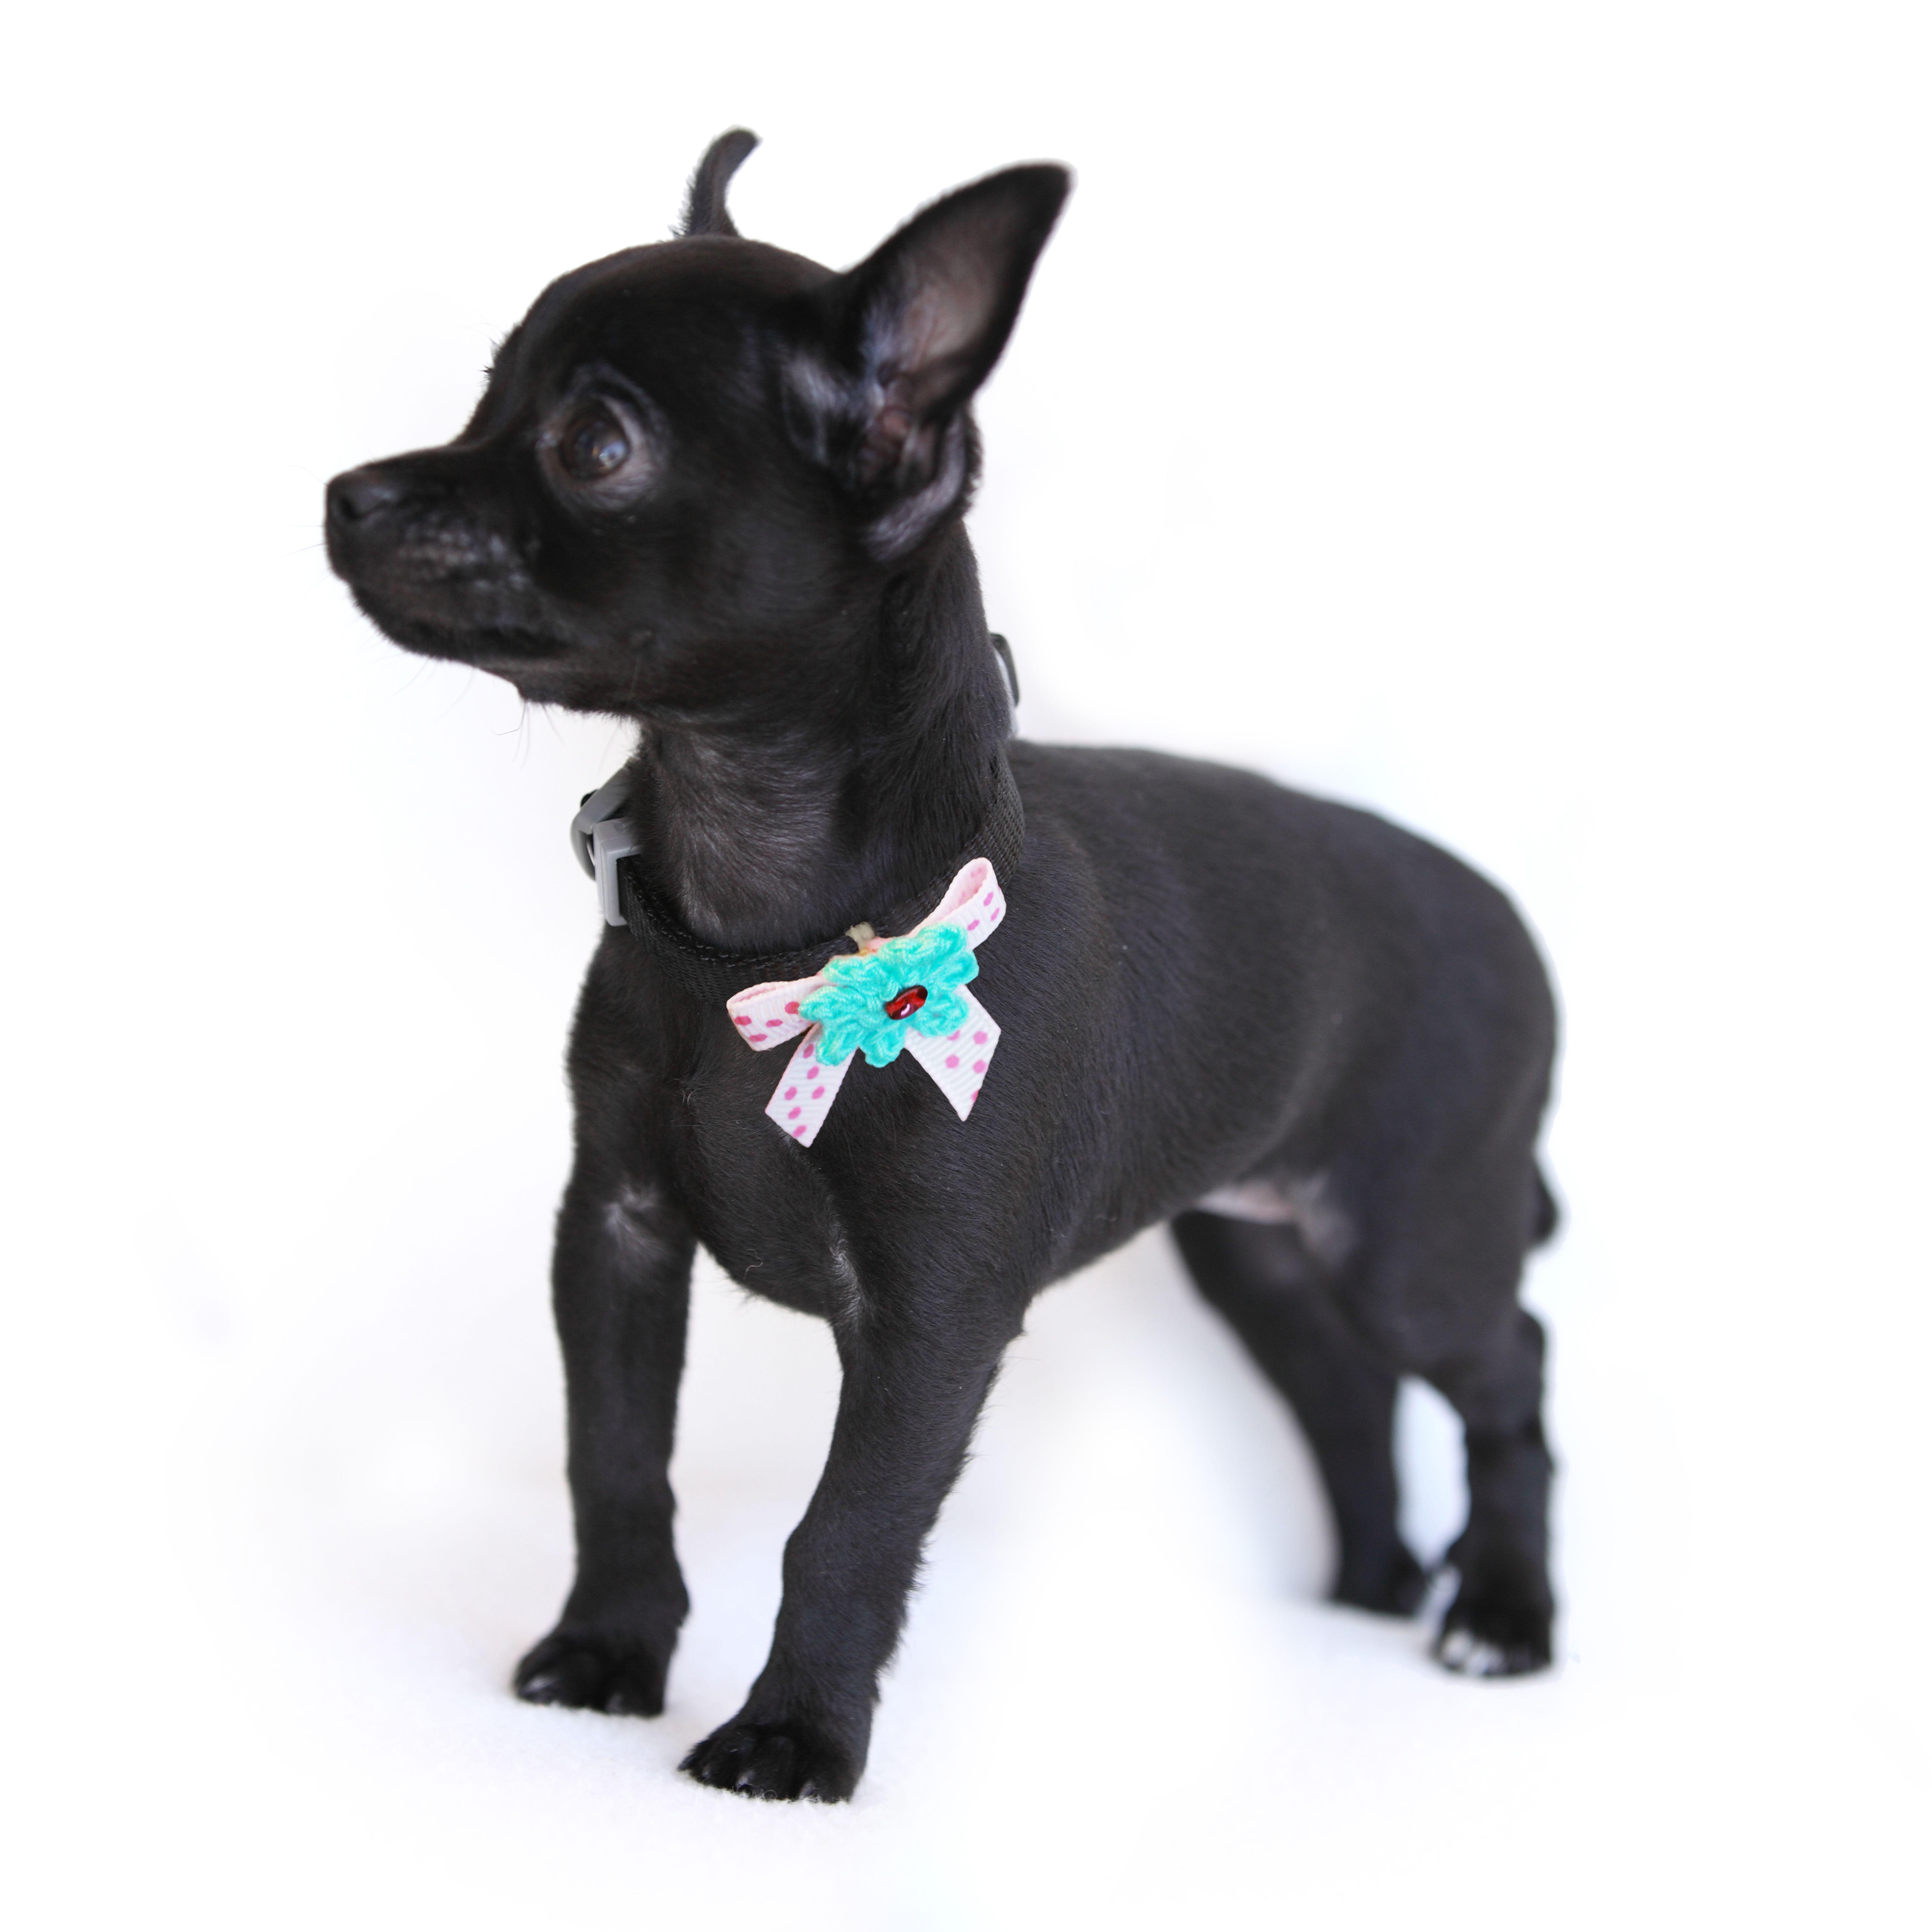 Most Inspiring Hair Bows Bow Adorable Dog - 64d44d46fb2dc2d58de5ad2db516f8a5  Pic_776959  .jpg